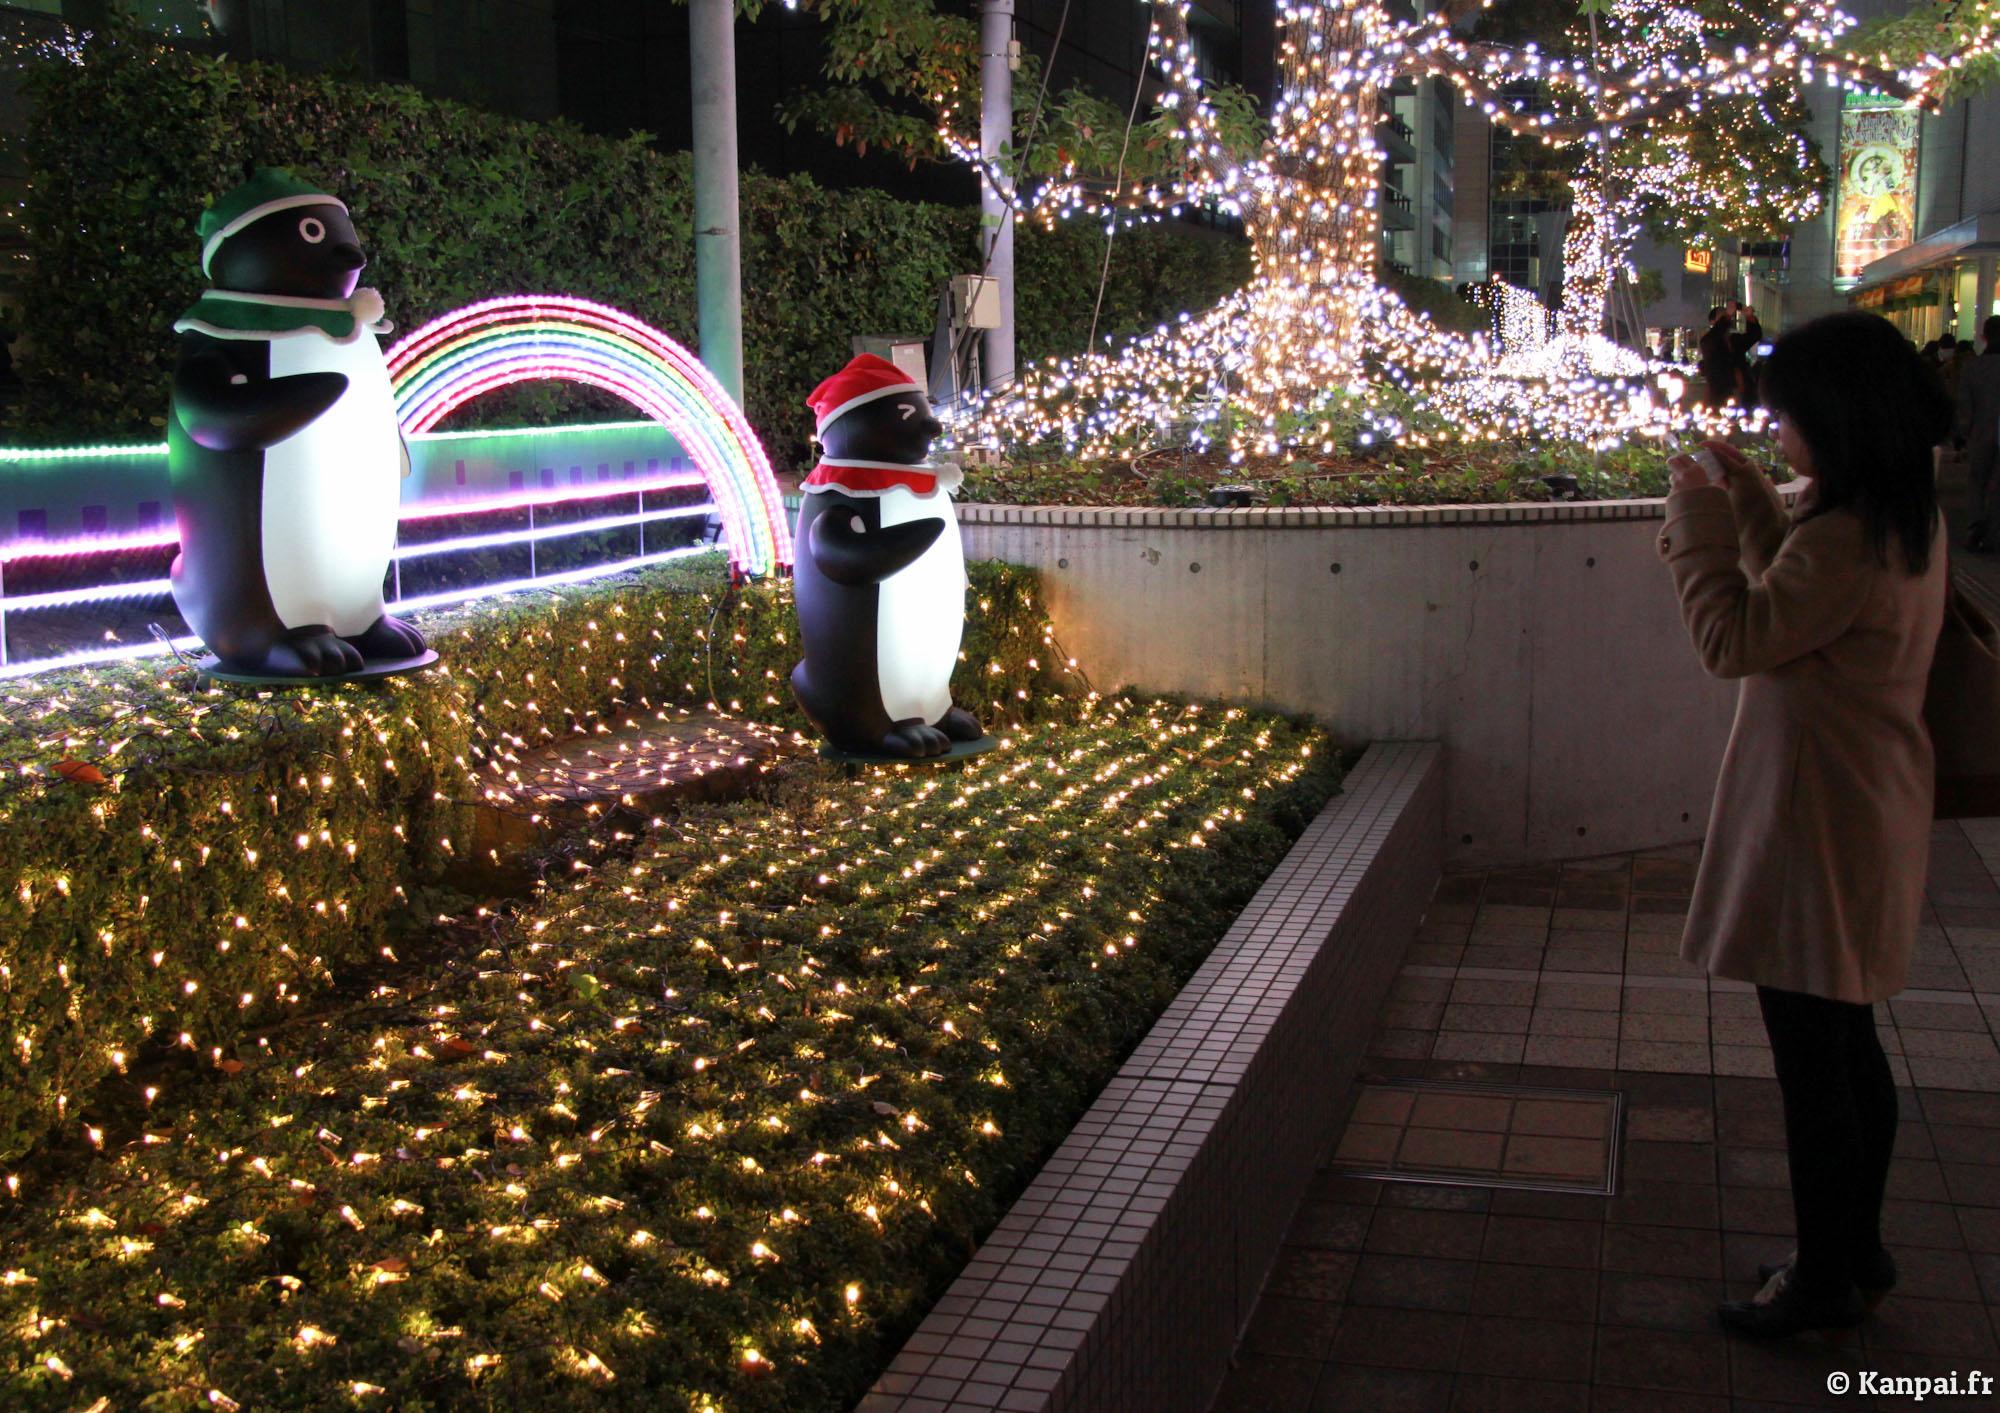 #9A6F31 Tokyo à Noël 5327 decorations de noel au japon 2000x1413 px @ aertt.com